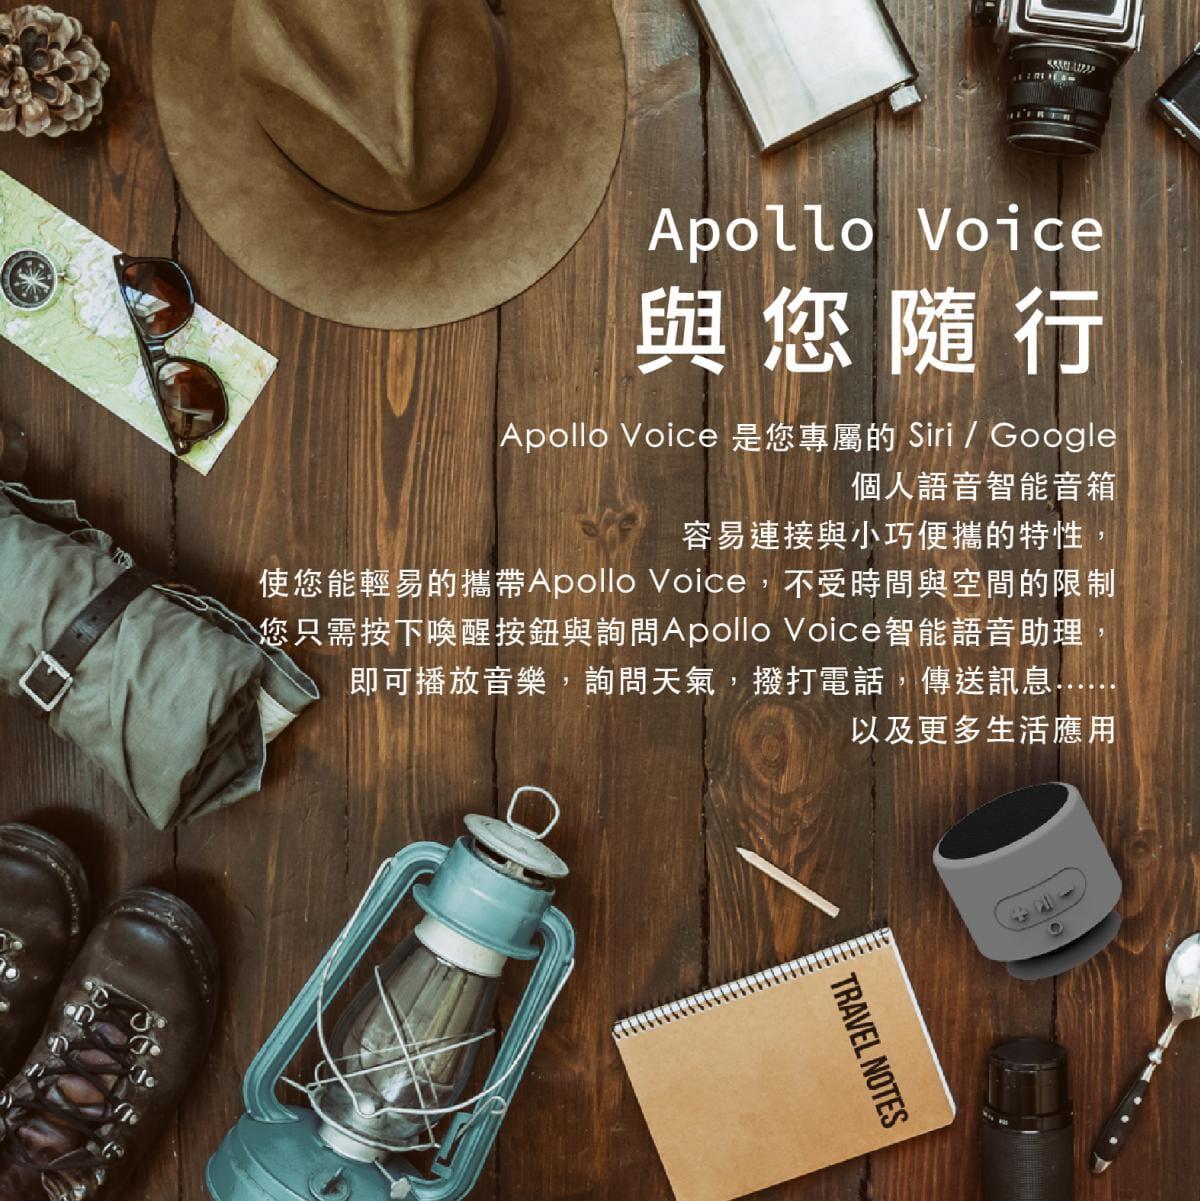 Addon Apollo Voice攜帶式Siri/Google藍芽智能音箱 5